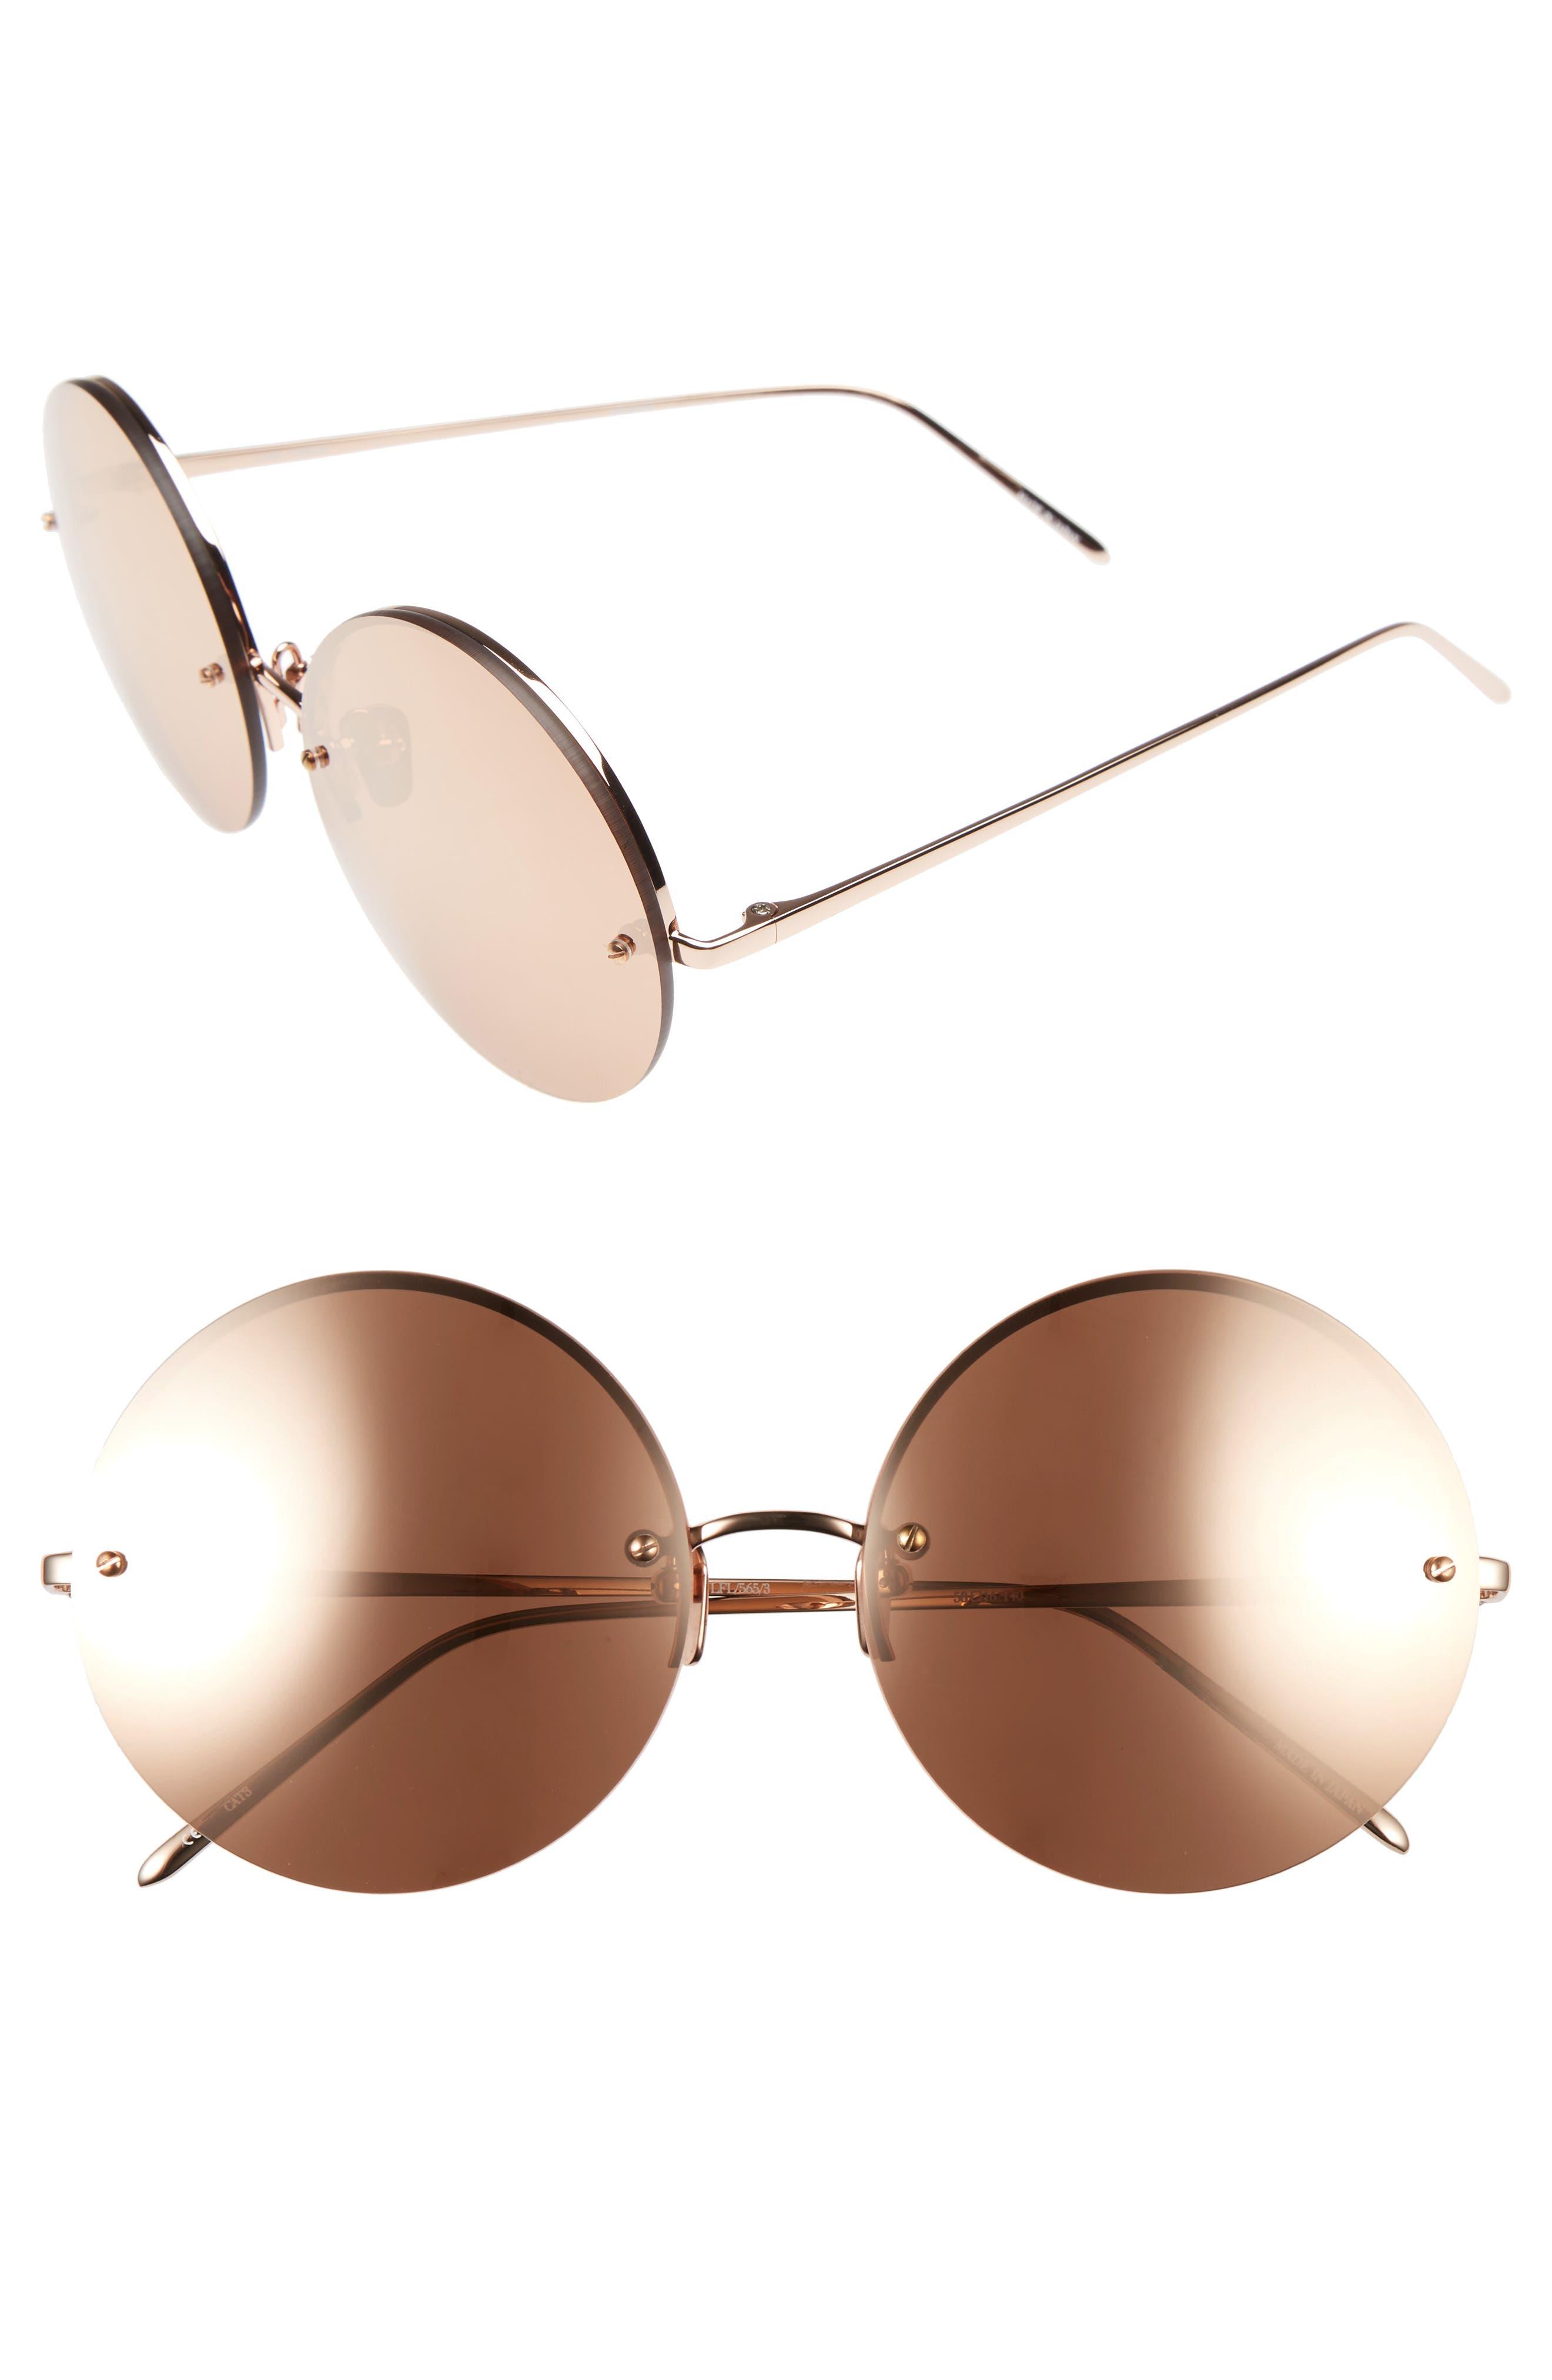 Linda Farrow 58mm 22 Karat Gold Trim Rimless Round Sunglasses